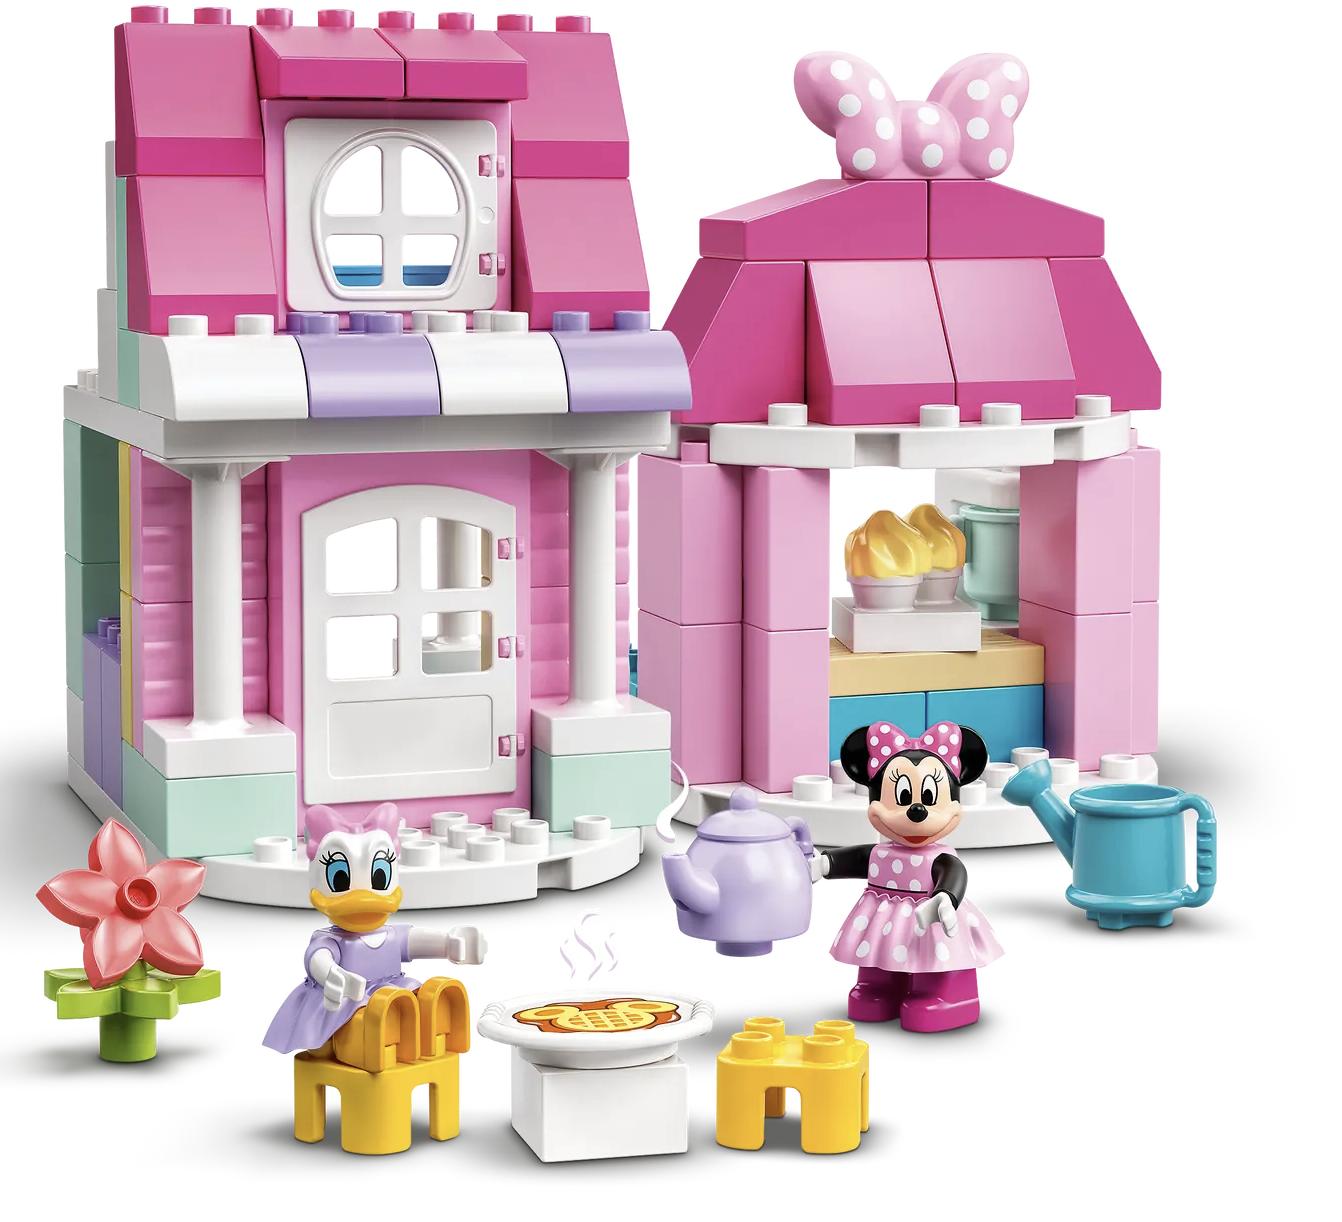 LEGO DUPLO DISNEY MINNIE`S HOUSE AND CAFE